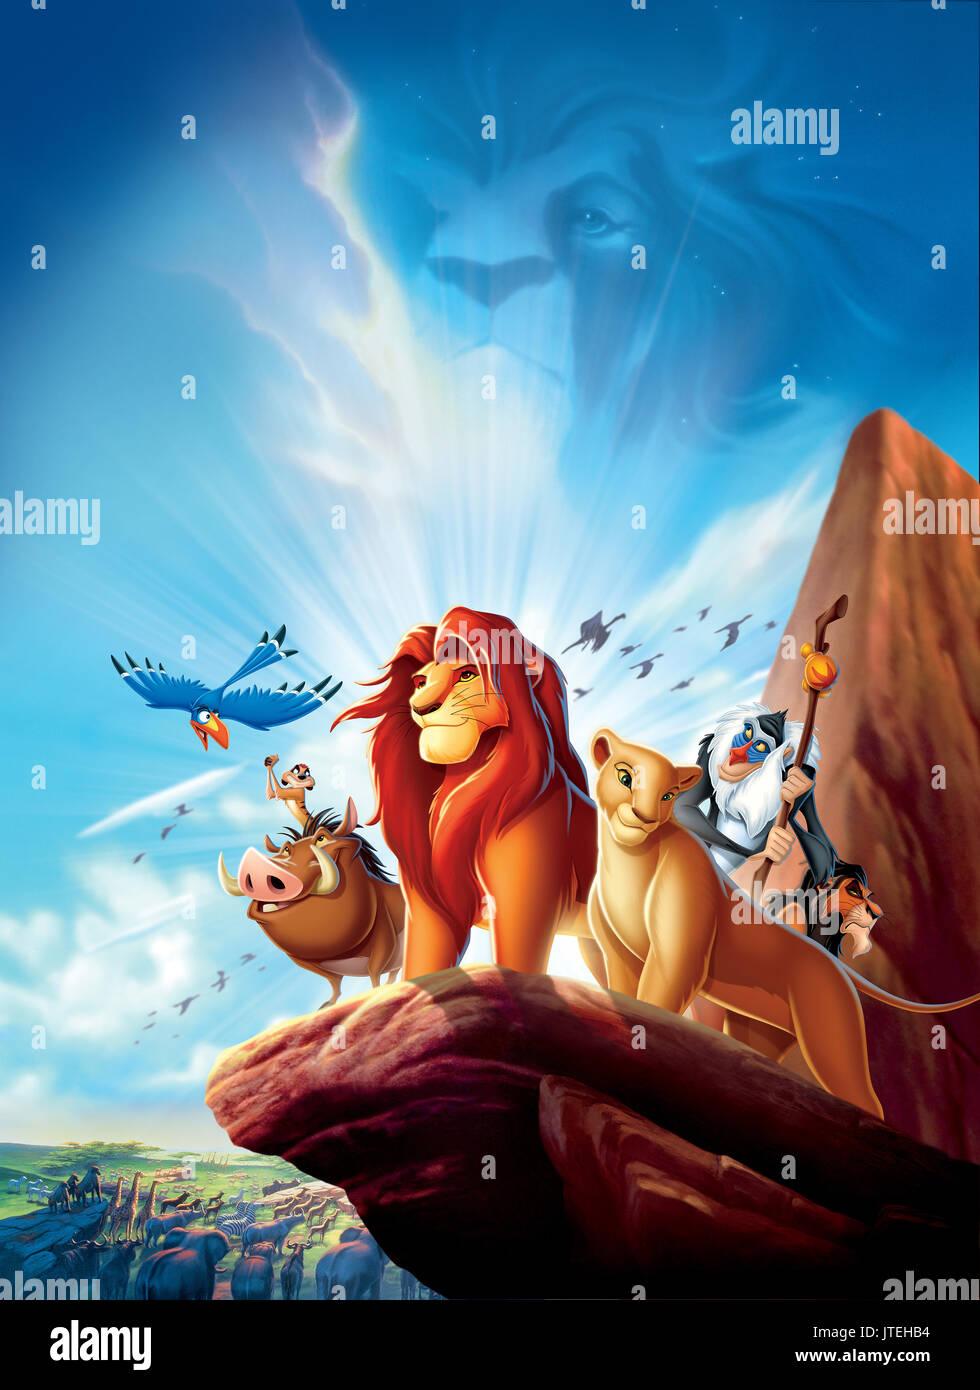 zazu simba nala rafiki timon pumbaa  u0026 scar the lion king